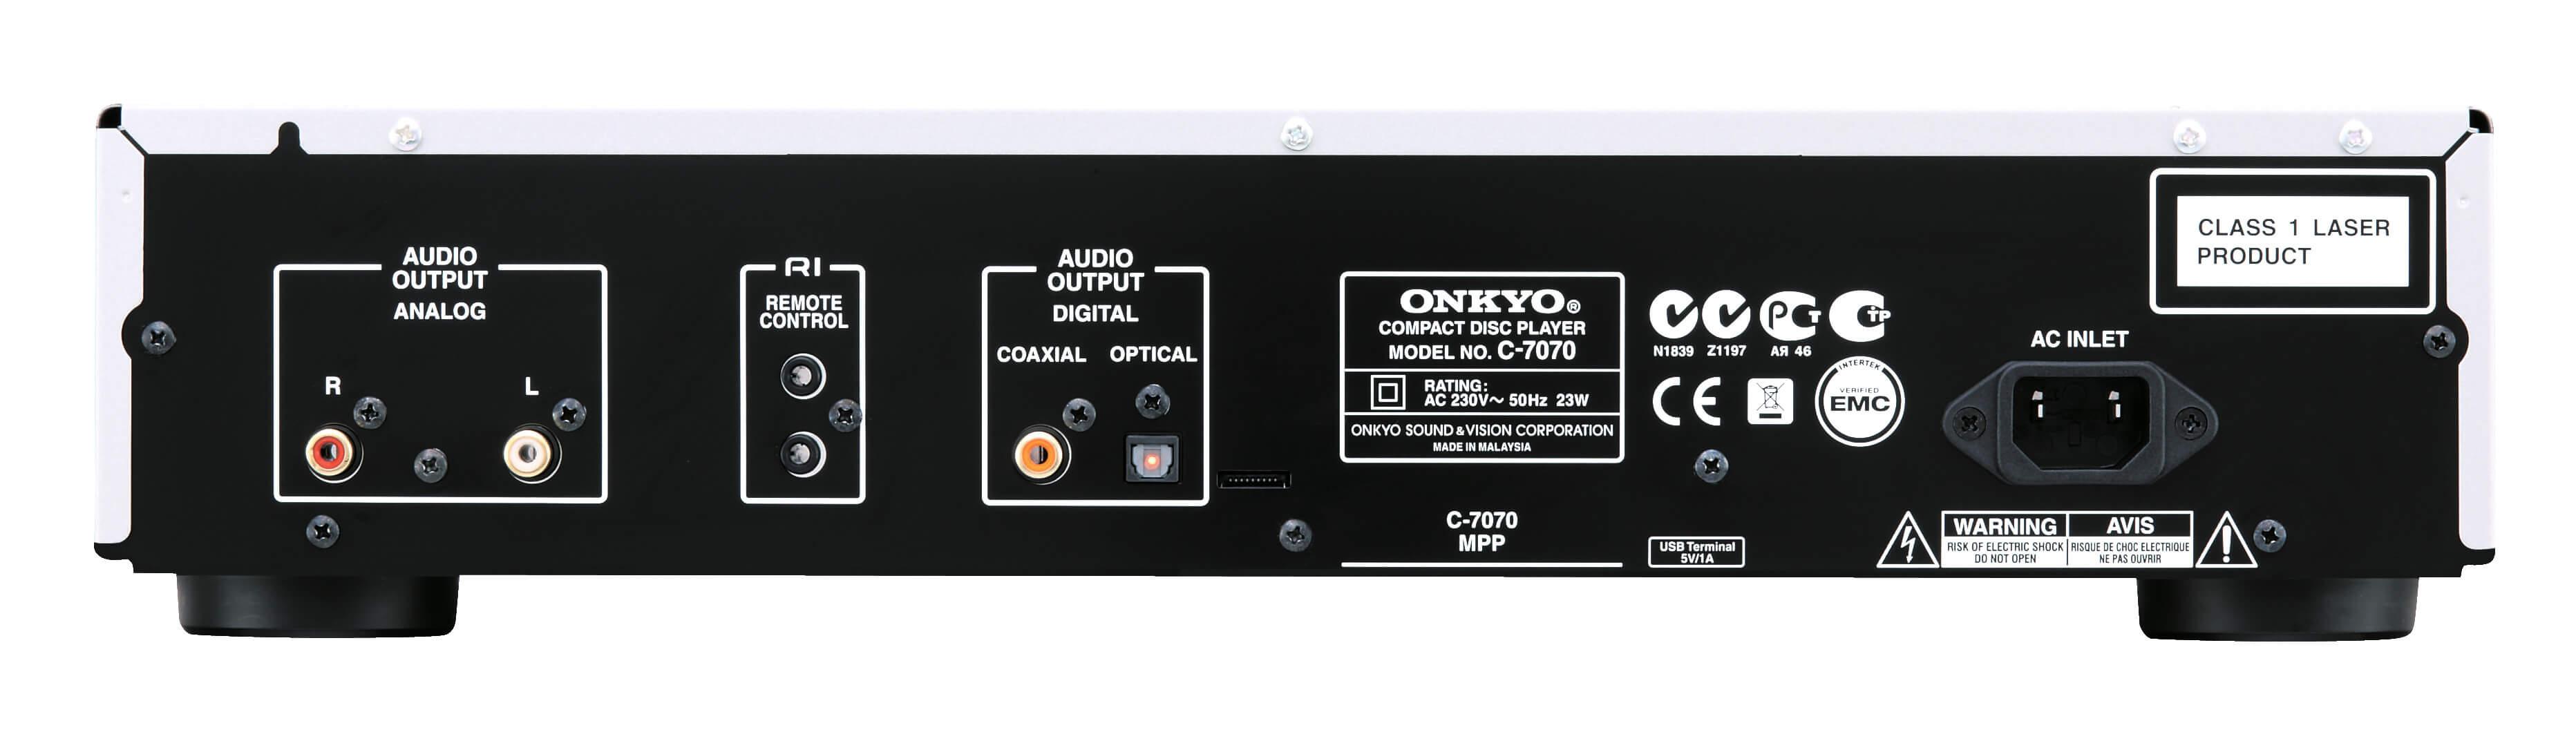 Image result for onkyo c-7070b